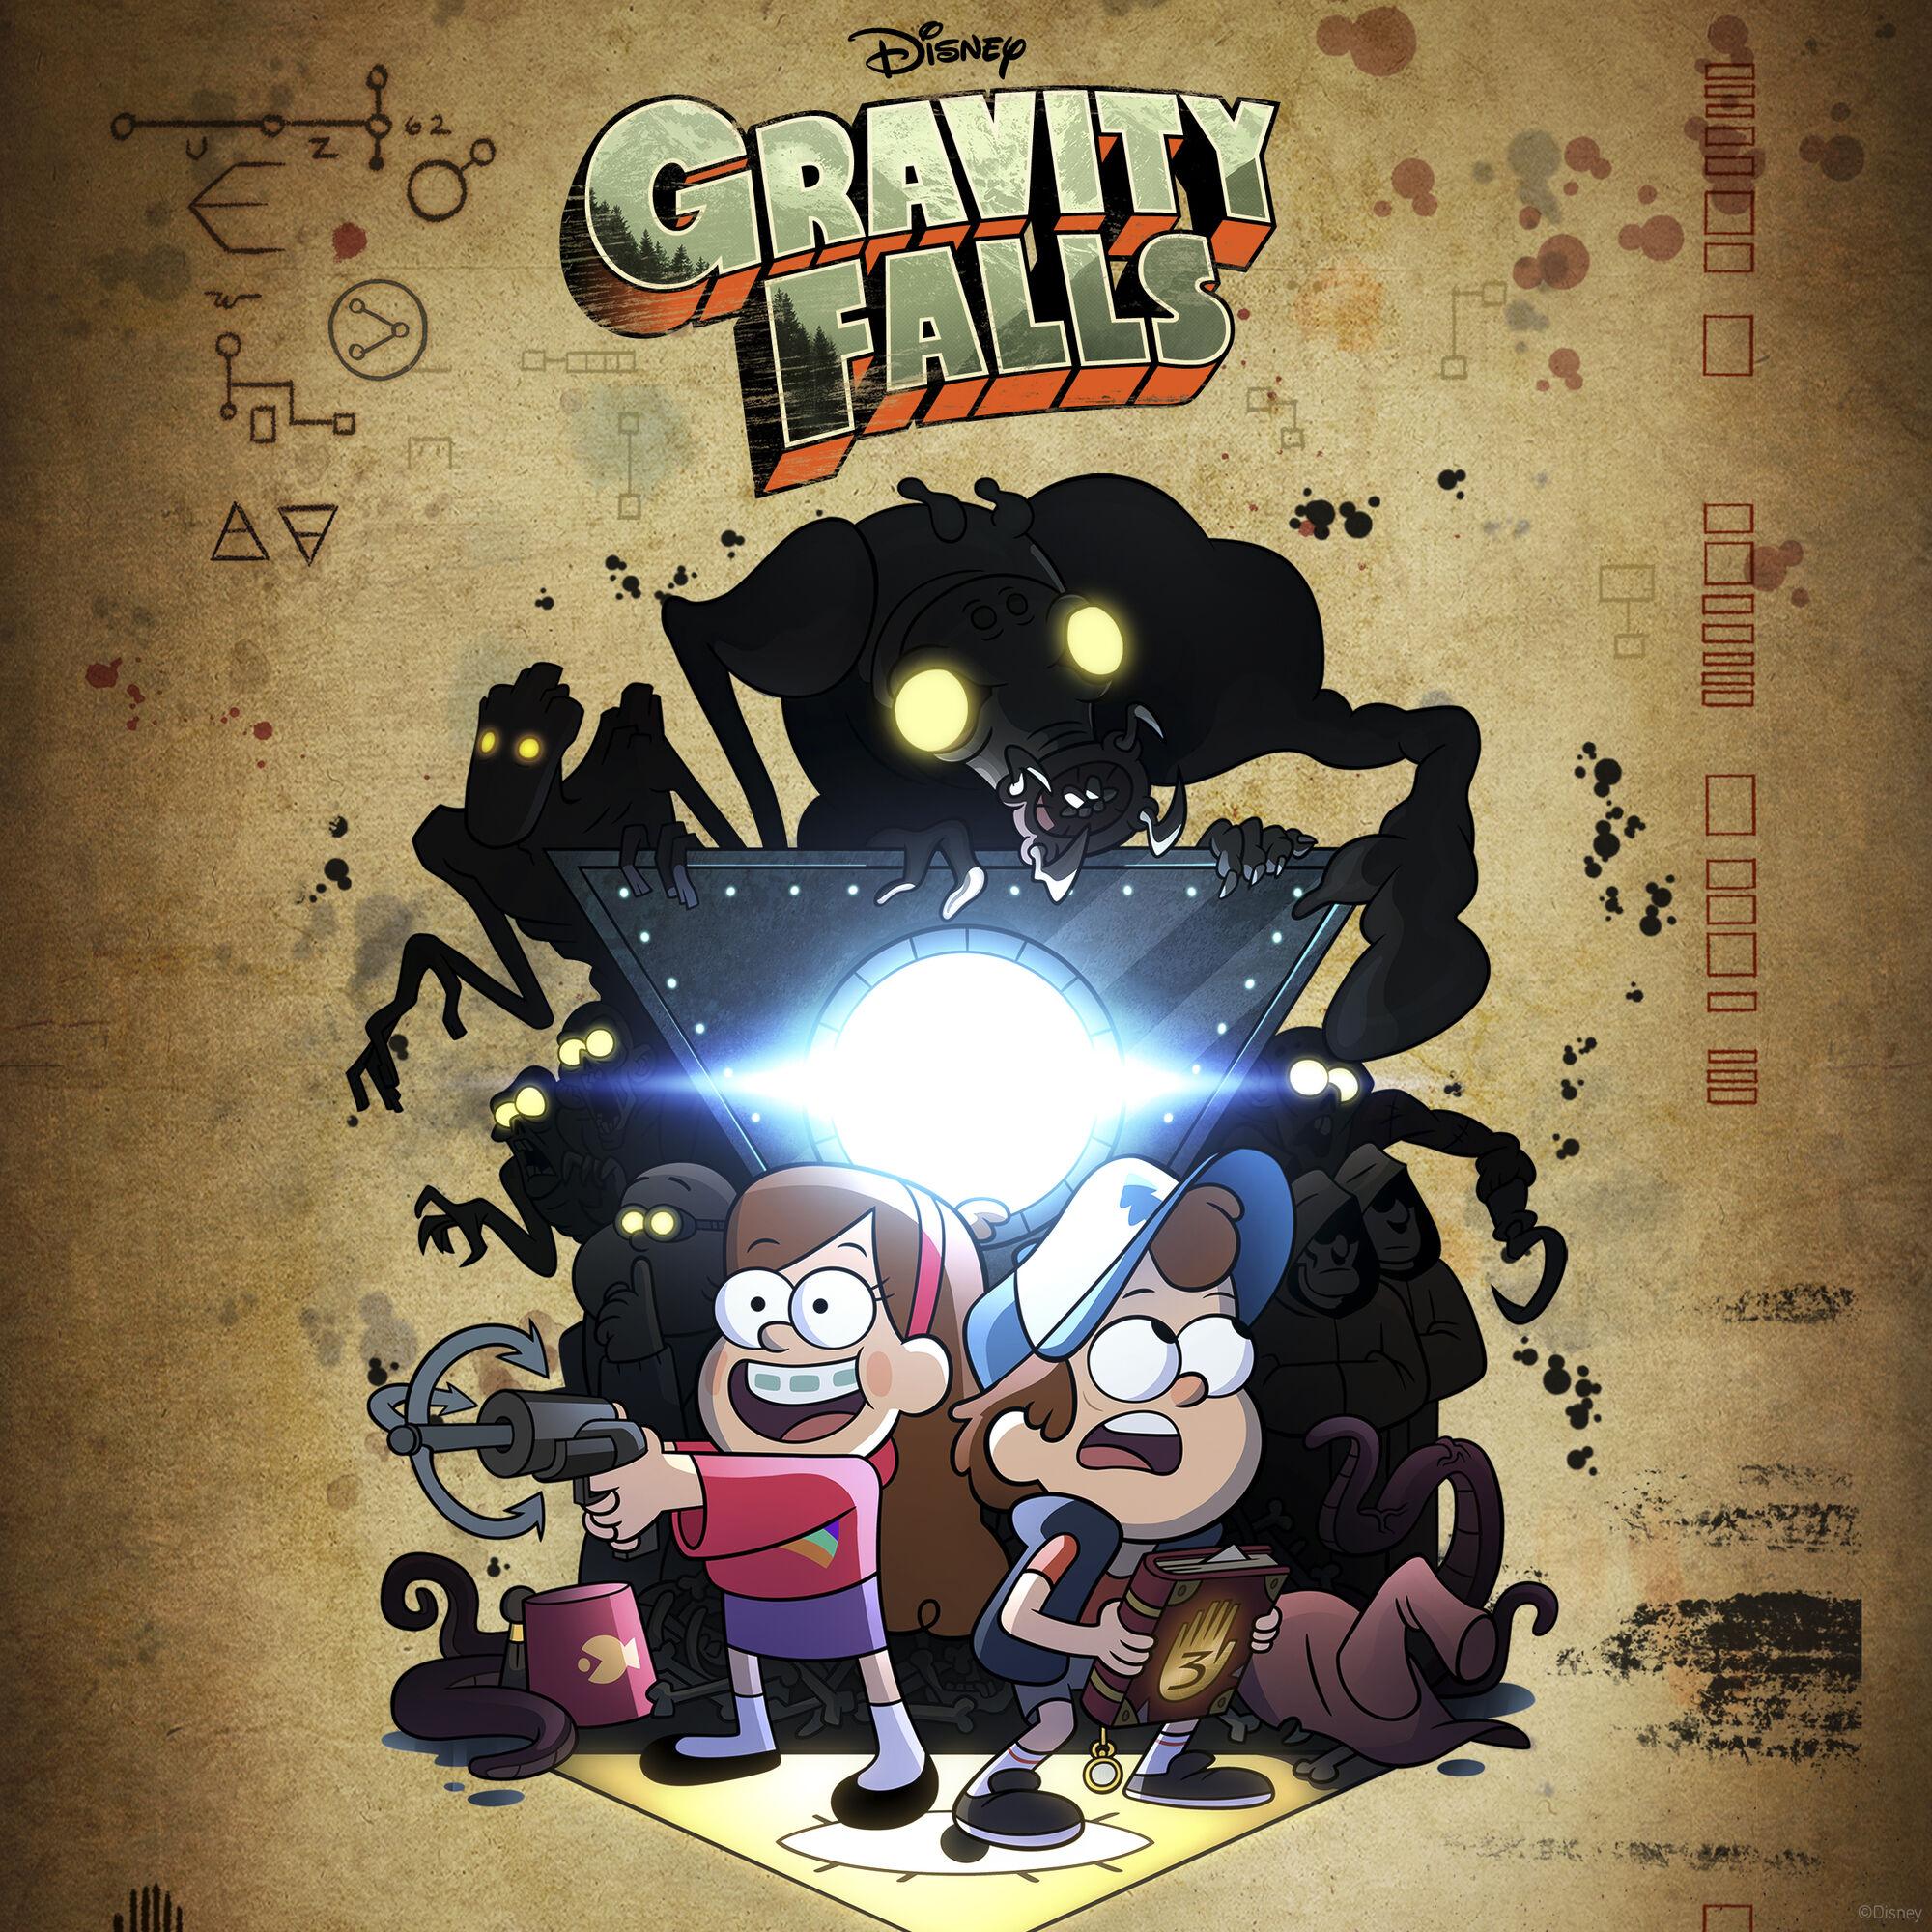 Watch Gravity Falls Season 1 For Free Online 123movies.com